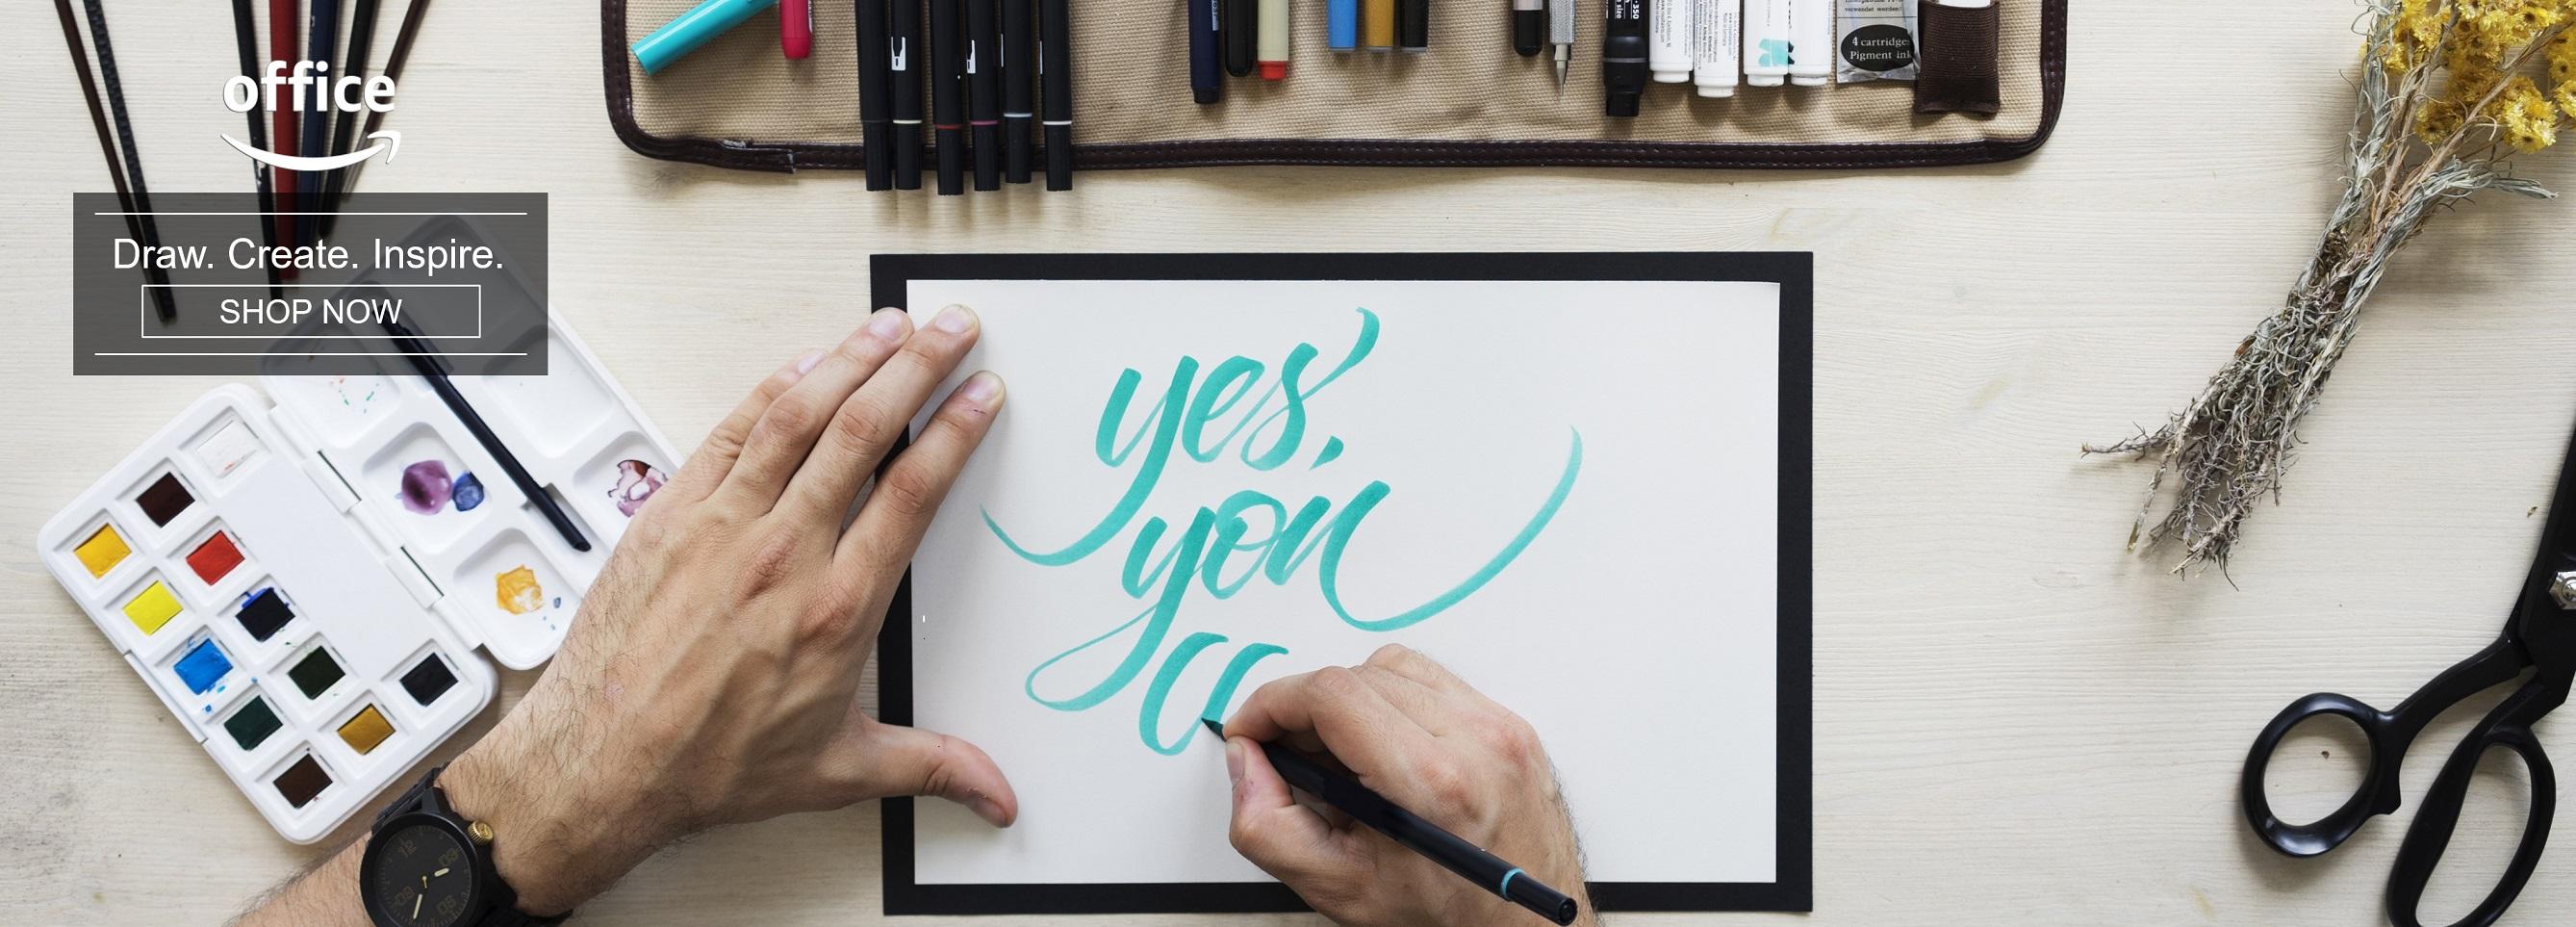 Draw. Create. Inspire.